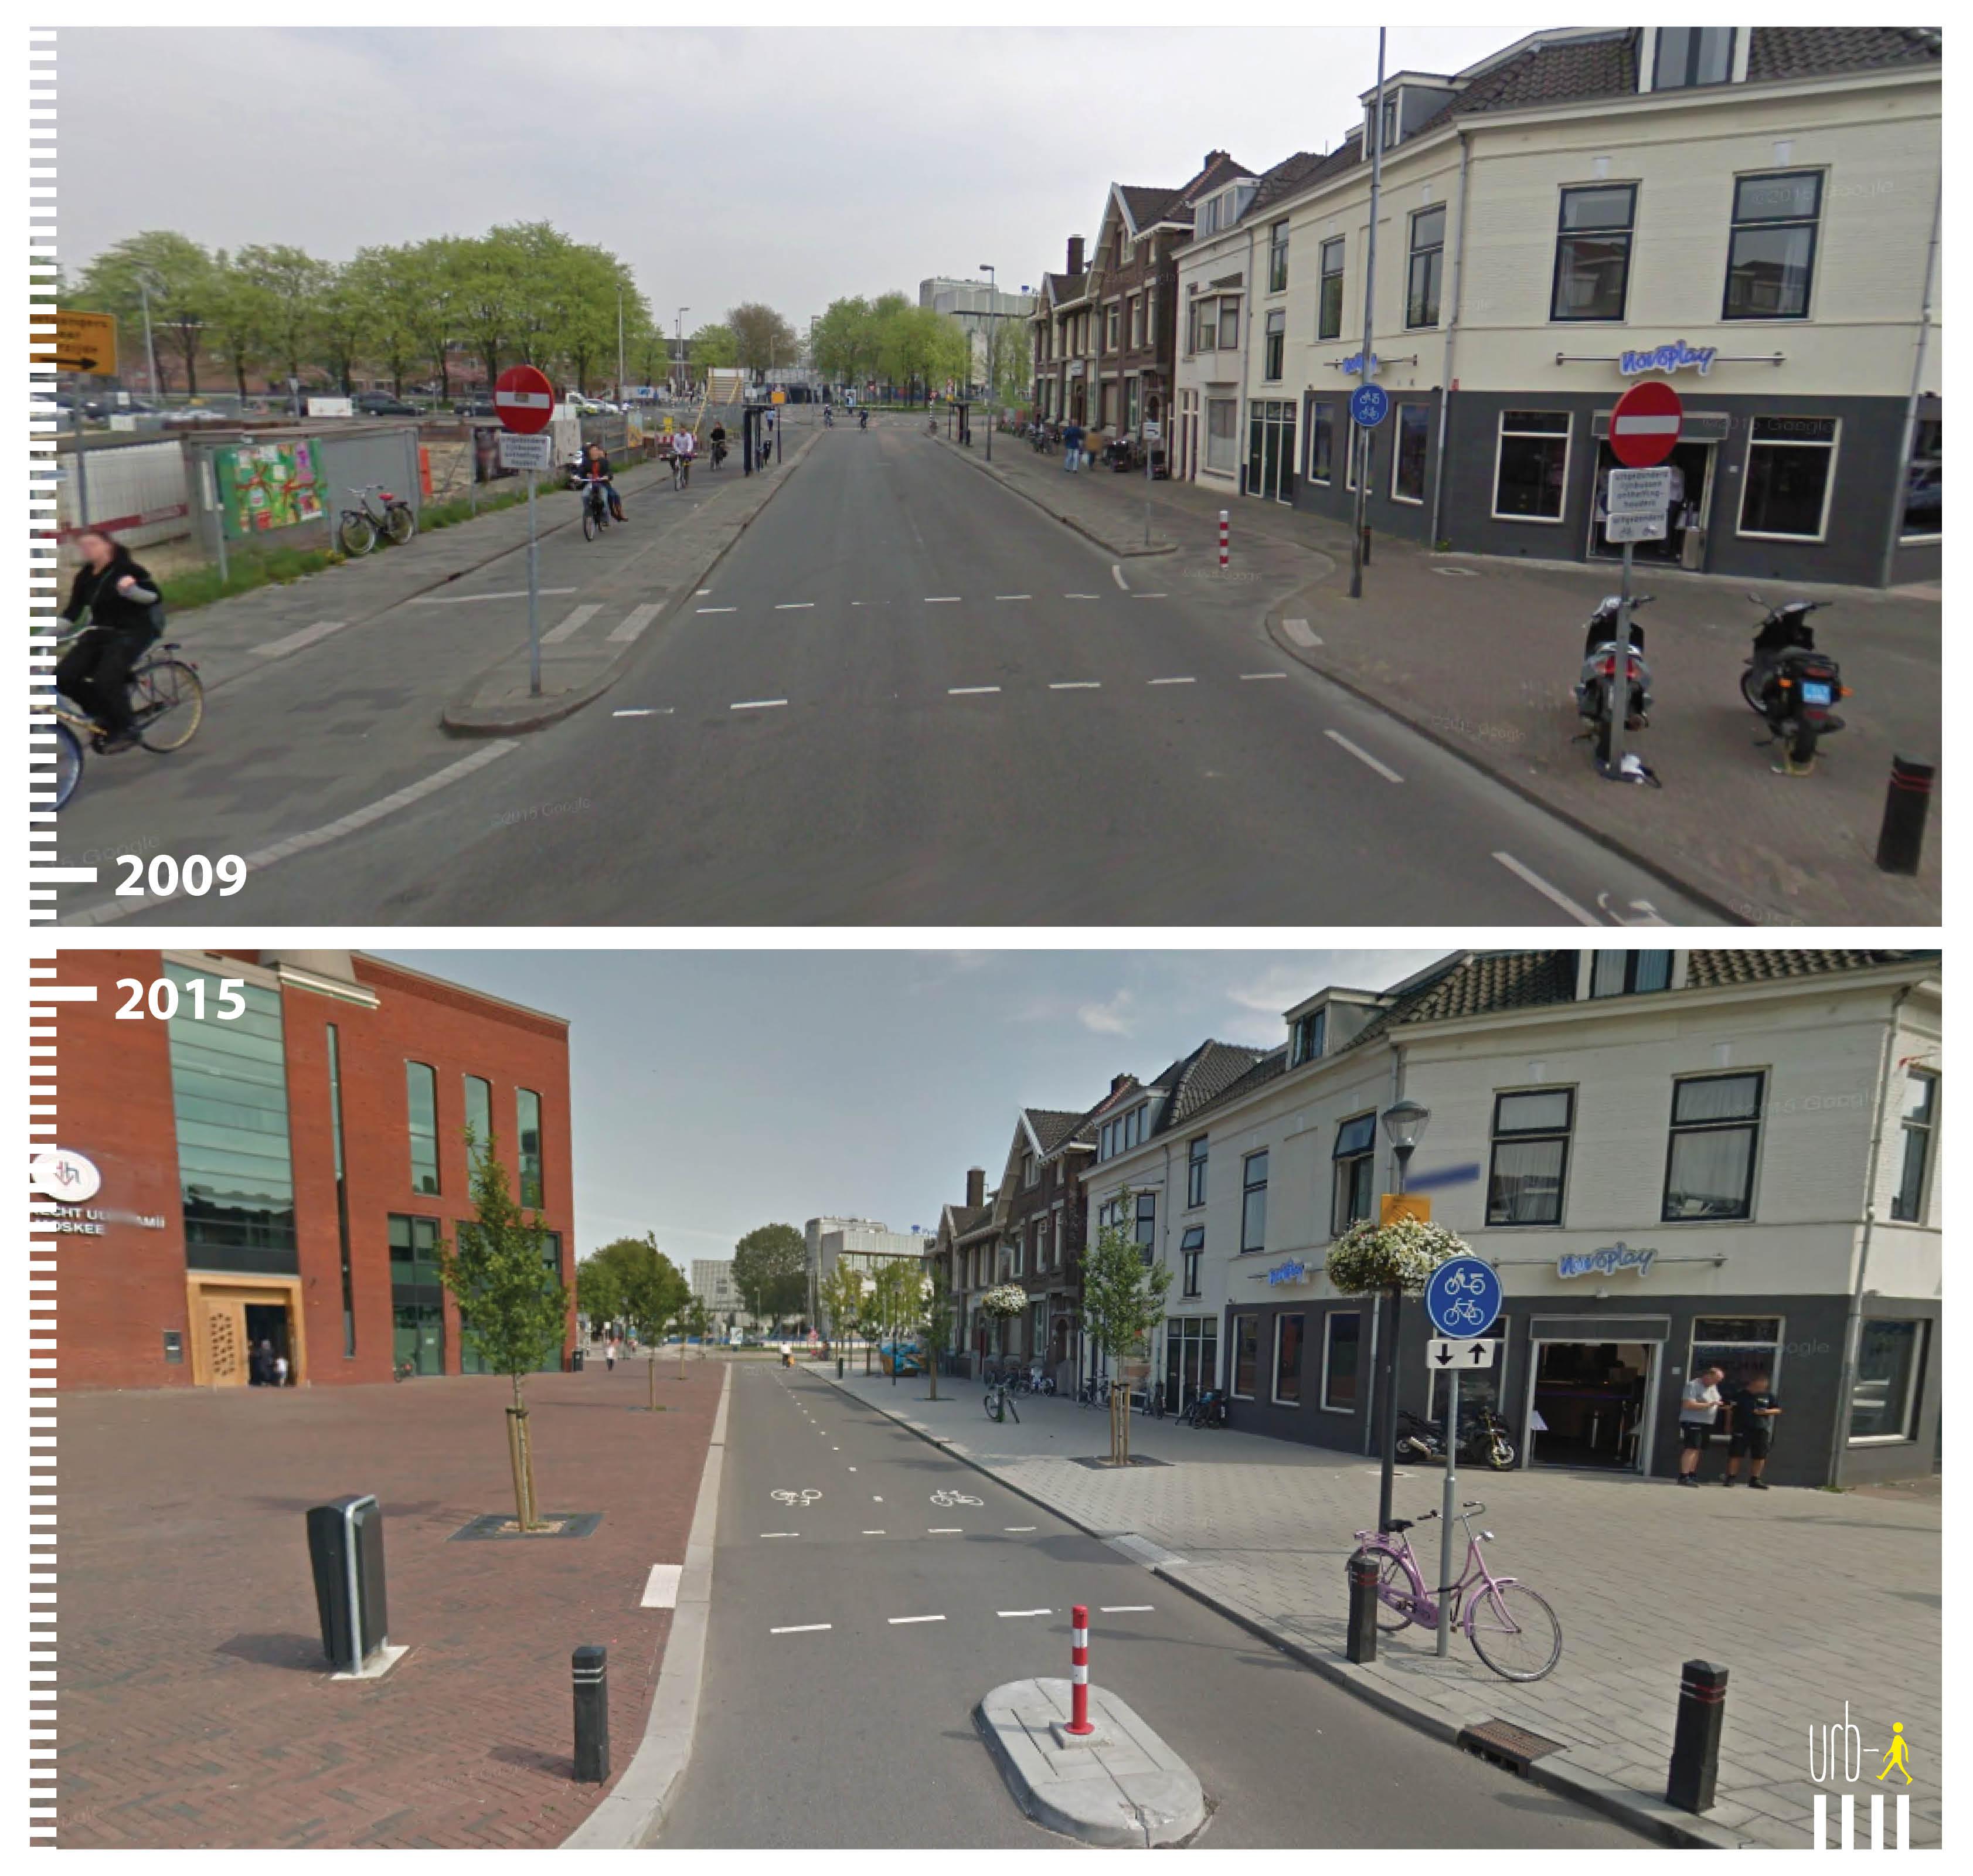 2093 NL Utrecht, Kanaalstraat